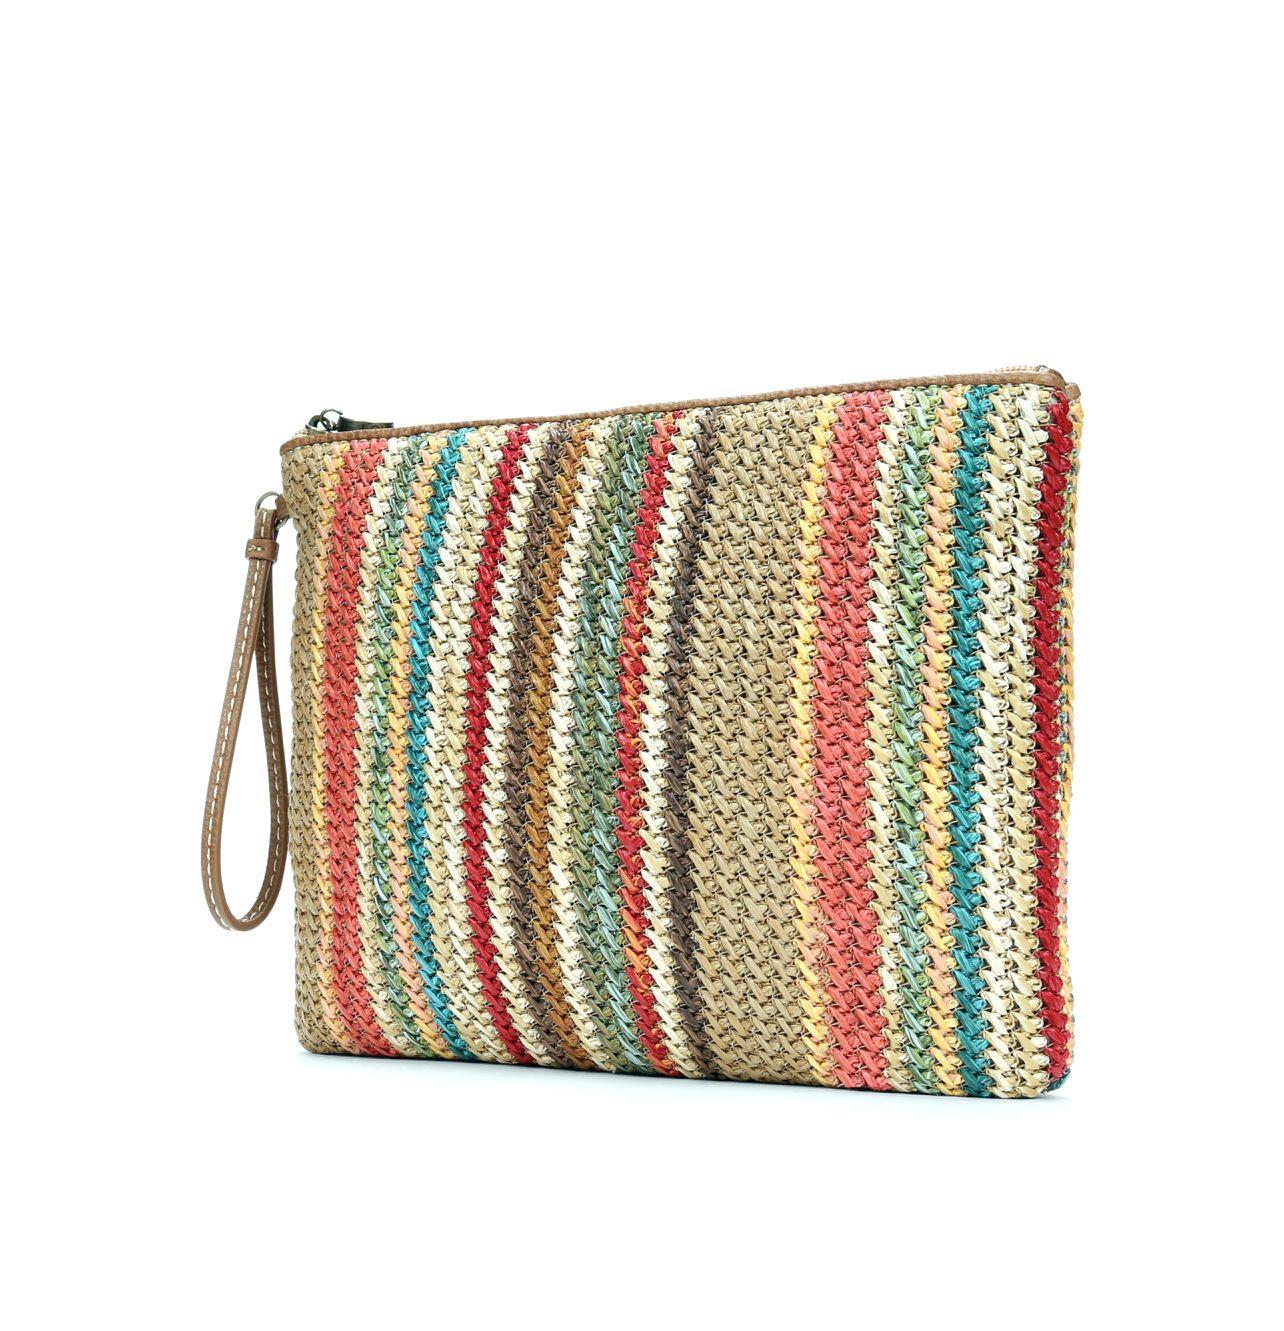 2014 Summer flatshots purse – for Susan Martin